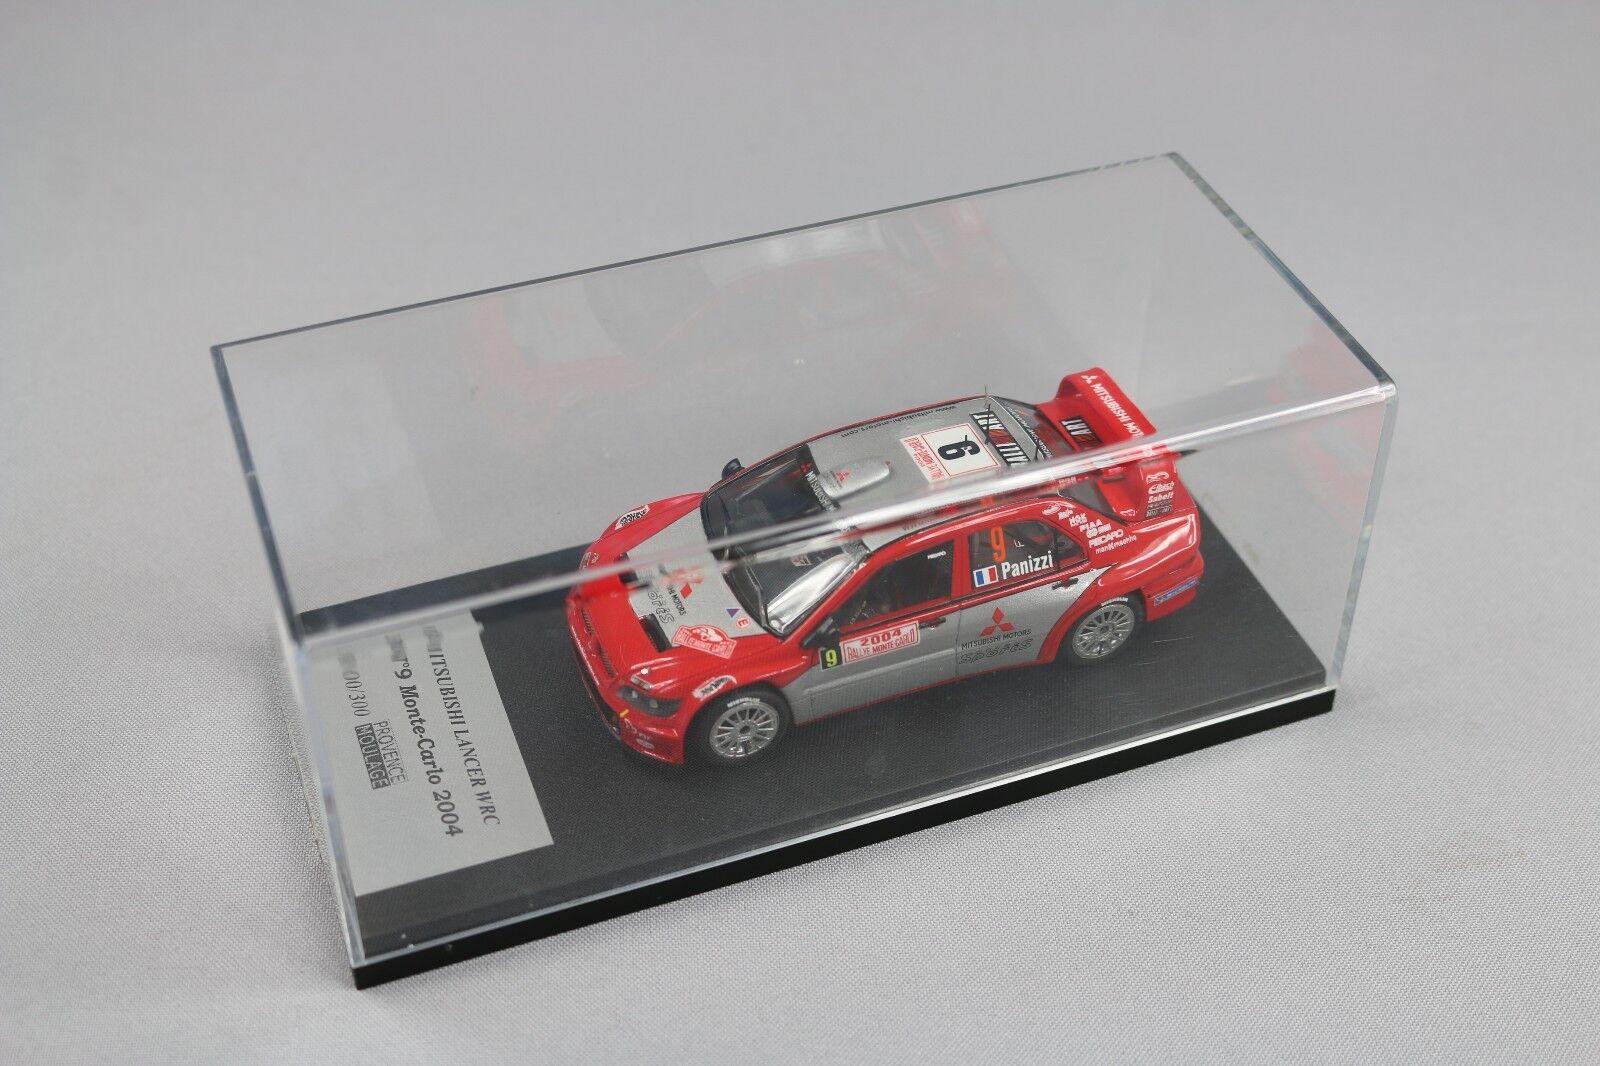 ZC607 Provence Moulage M024 Miniature 1  43 Mitsubishi Lancer Monte voiturelo 2004  rentable